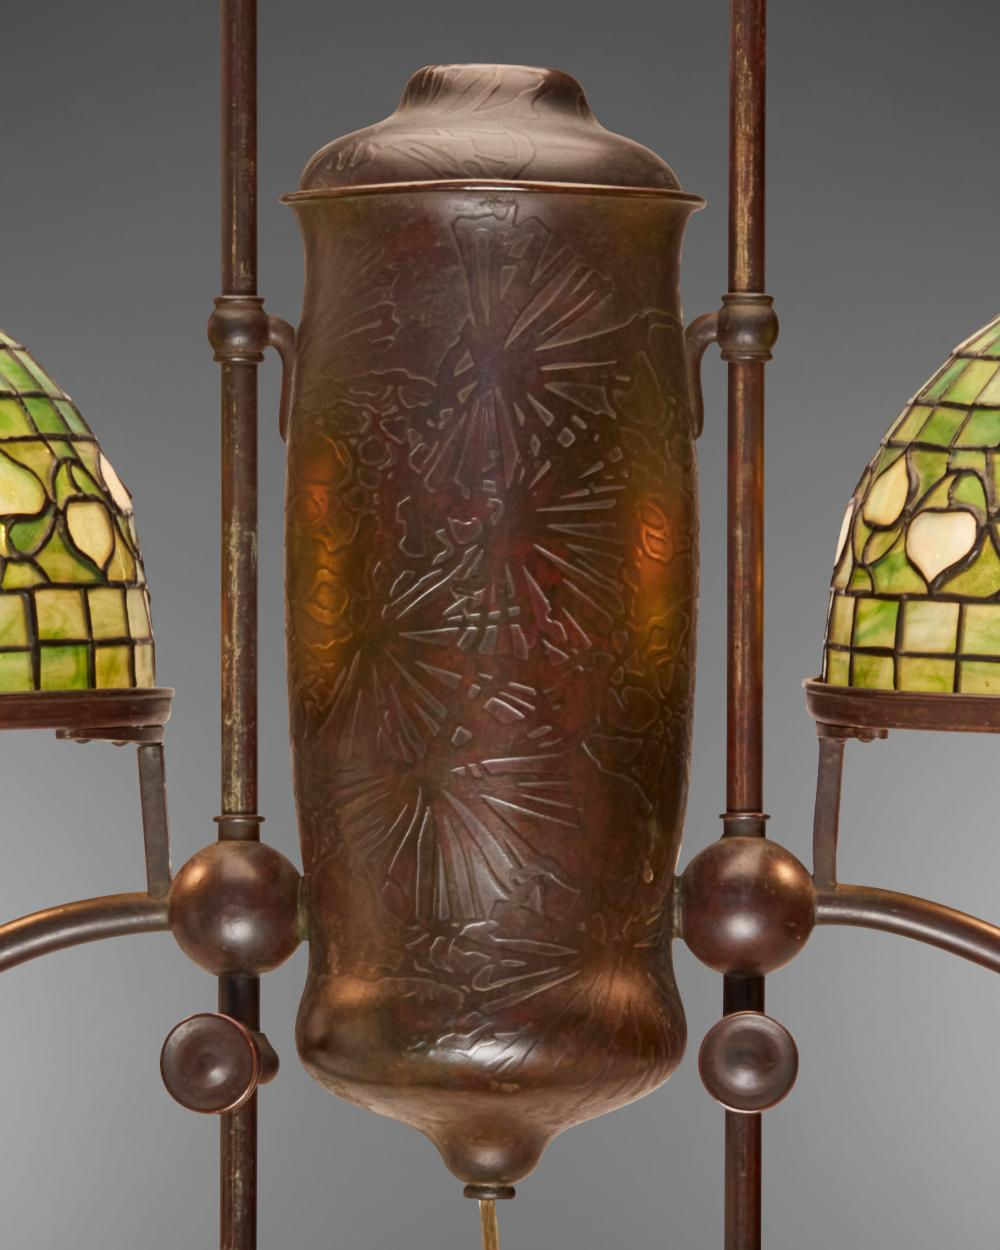 A Tiffany Studios double-arm student lamp